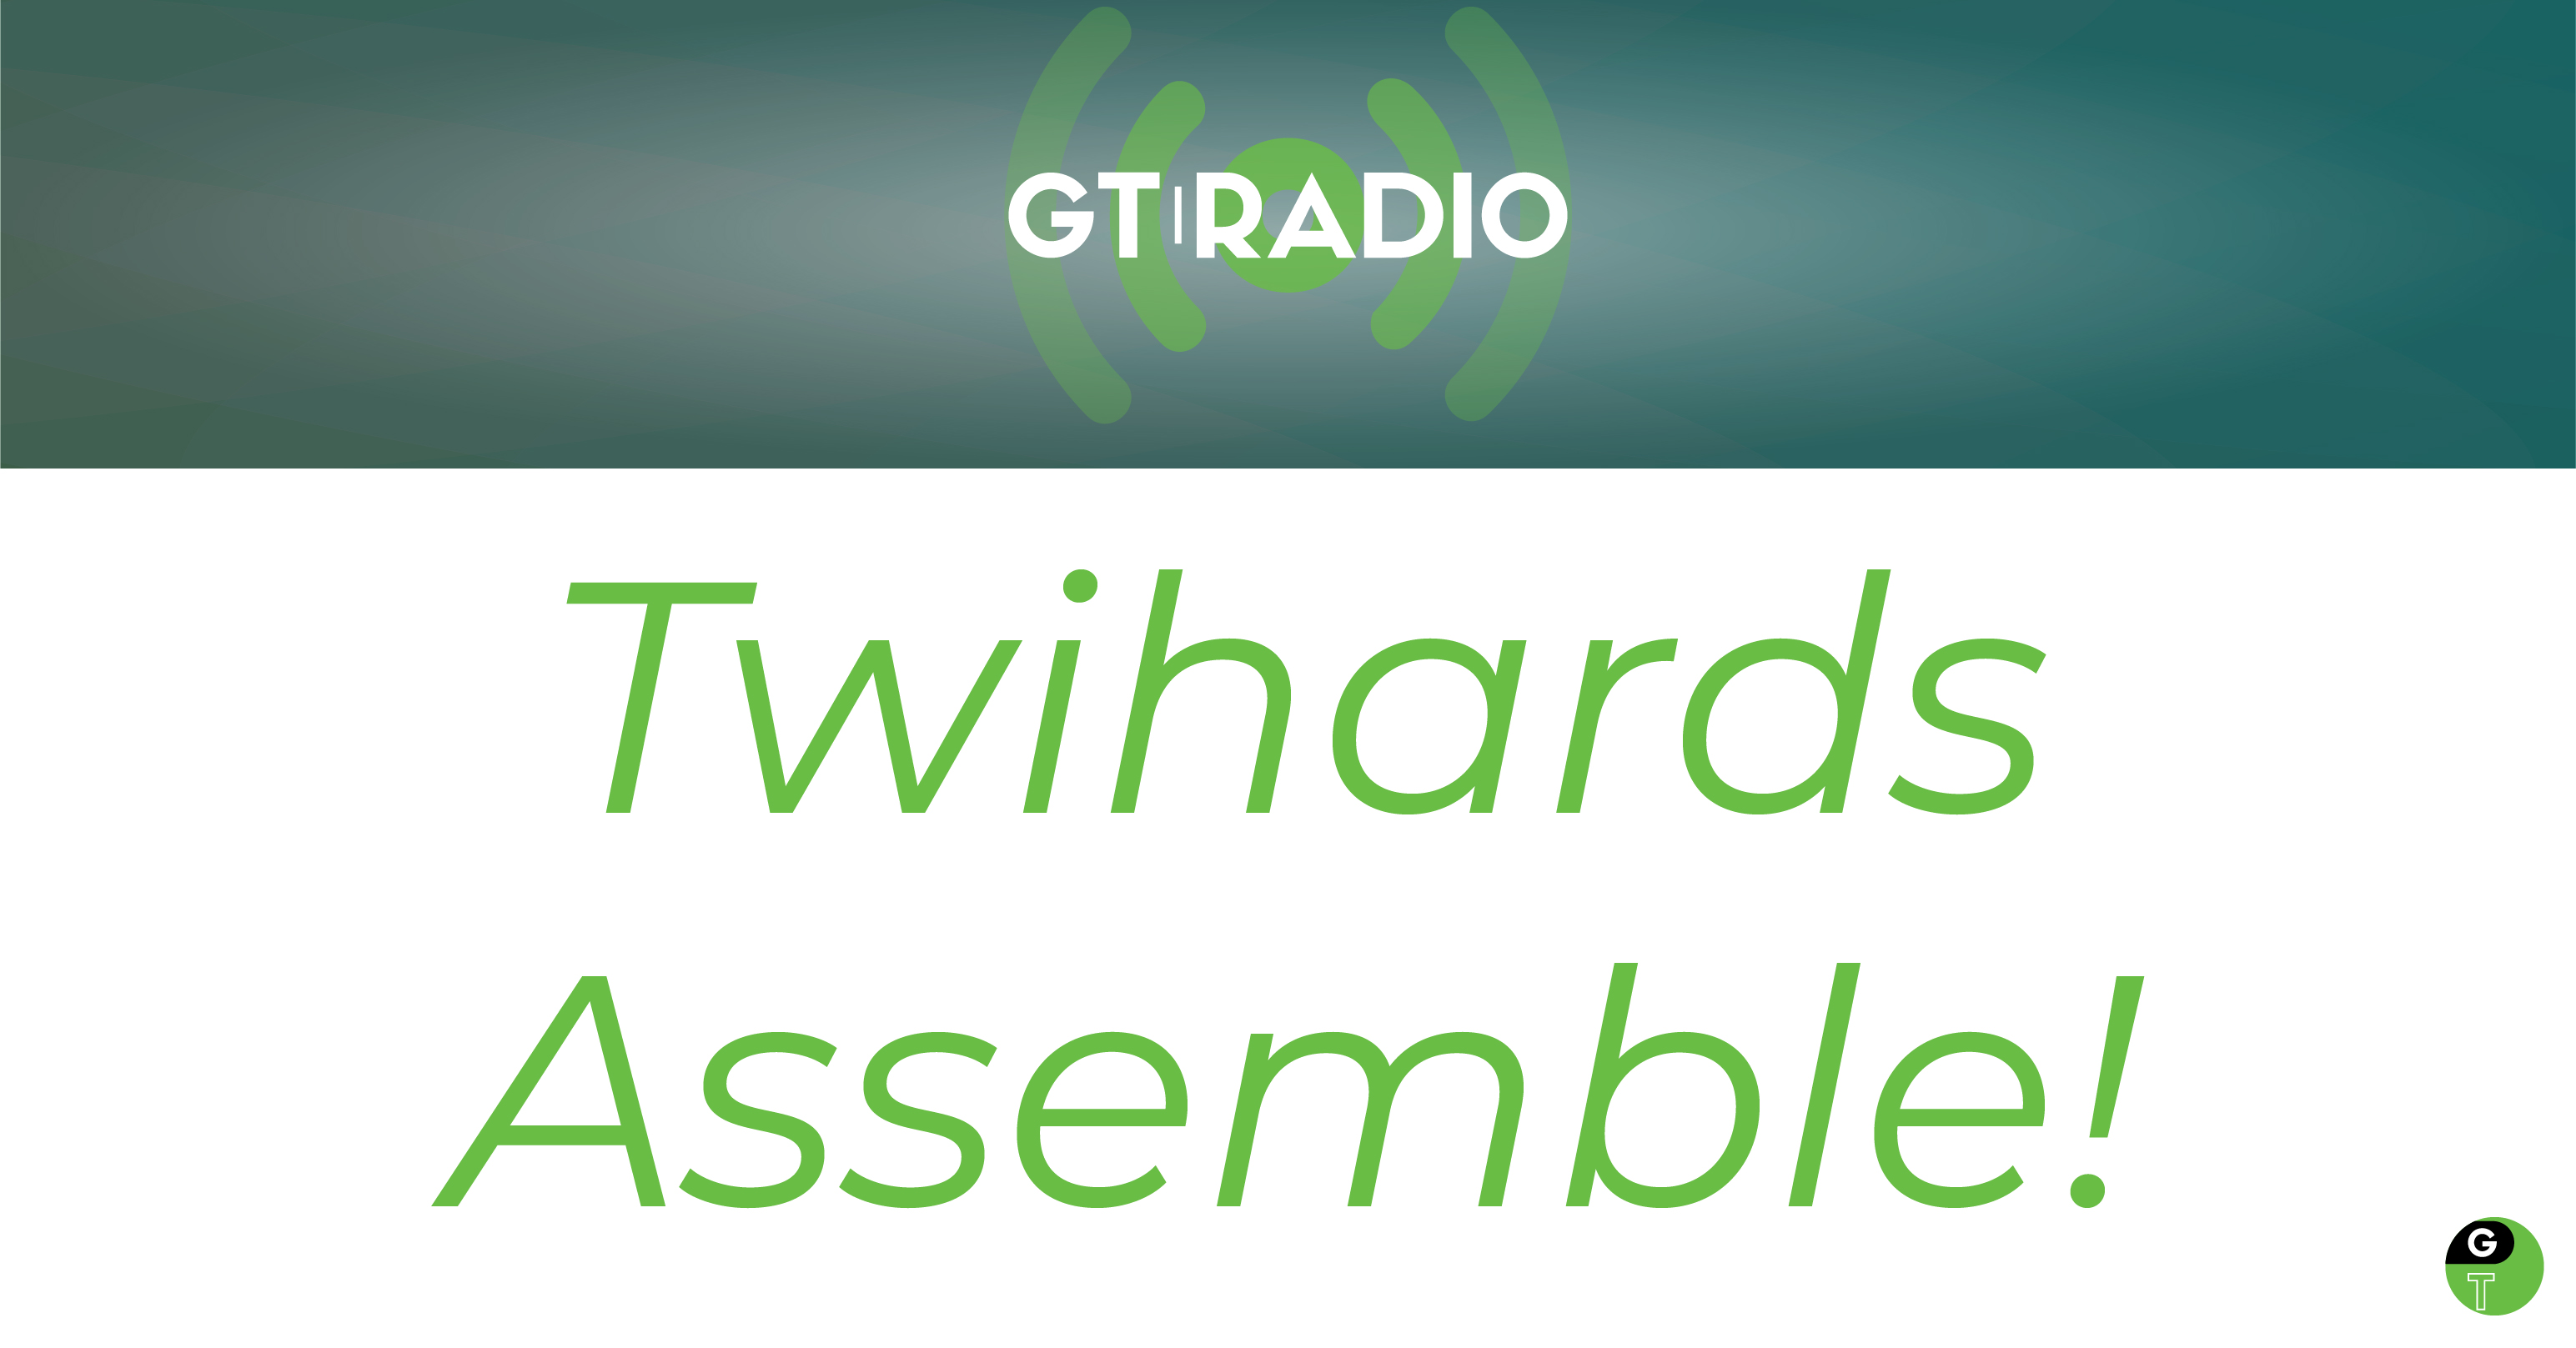 twihards assemble